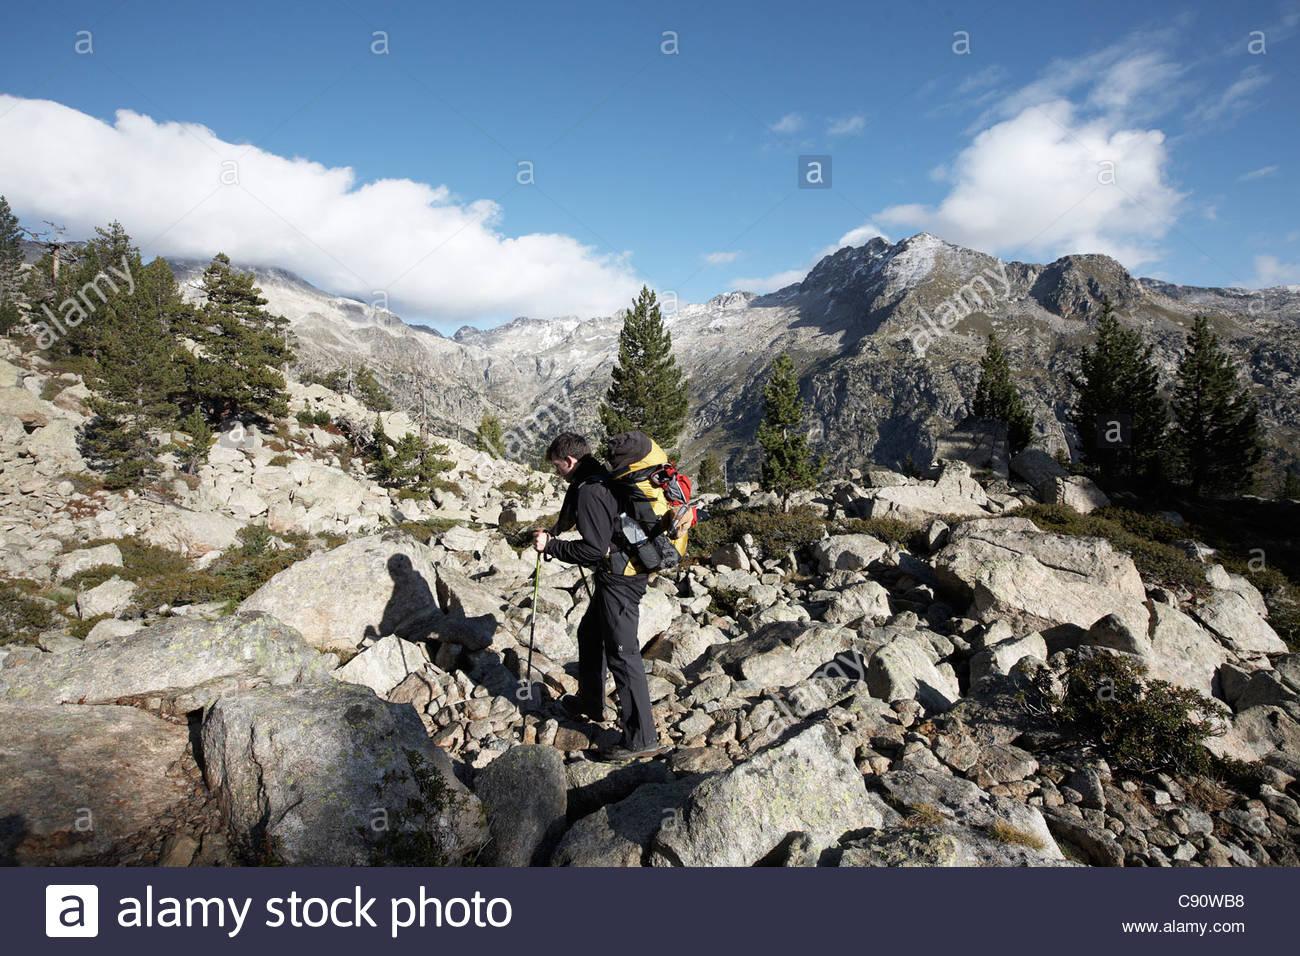 Hiker passing scree, Rundweg Carros de Foc, Nationalpark Aigueestortes i Estany de Sant Maurici, Katalonien, Spanien - Stock Image